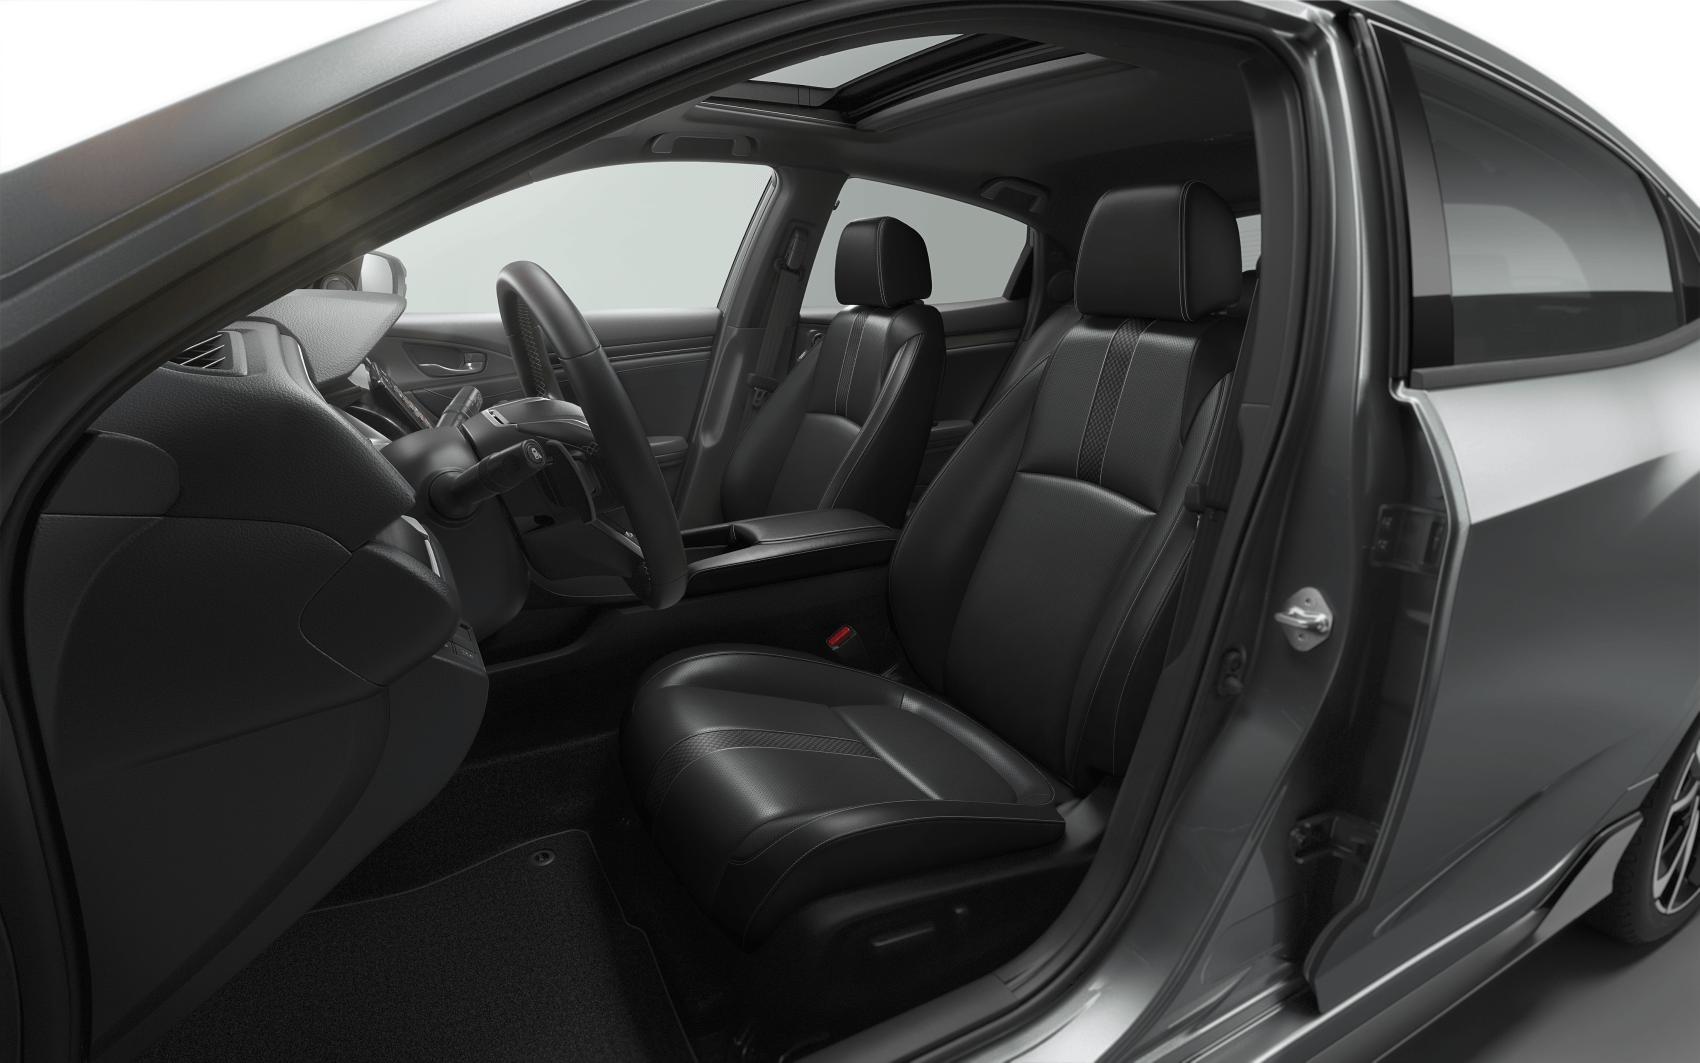 2021 Honda Civic Sport Interior Cabin Space Norm Reeves Honda Superstore